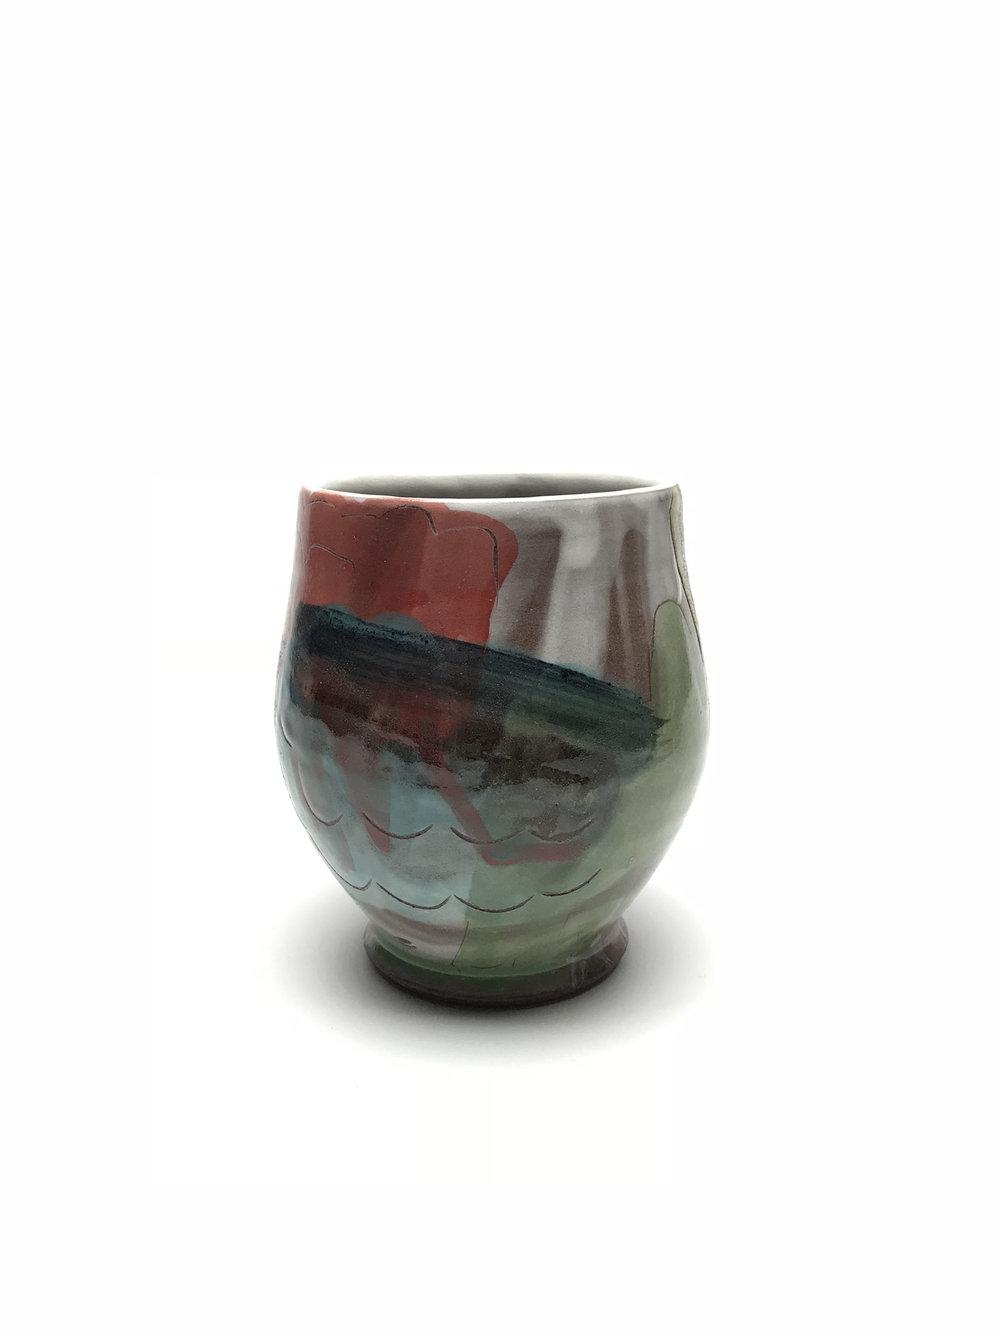 Teabowl  Earthen Red Clay, Slips, Underglaze, Glaze